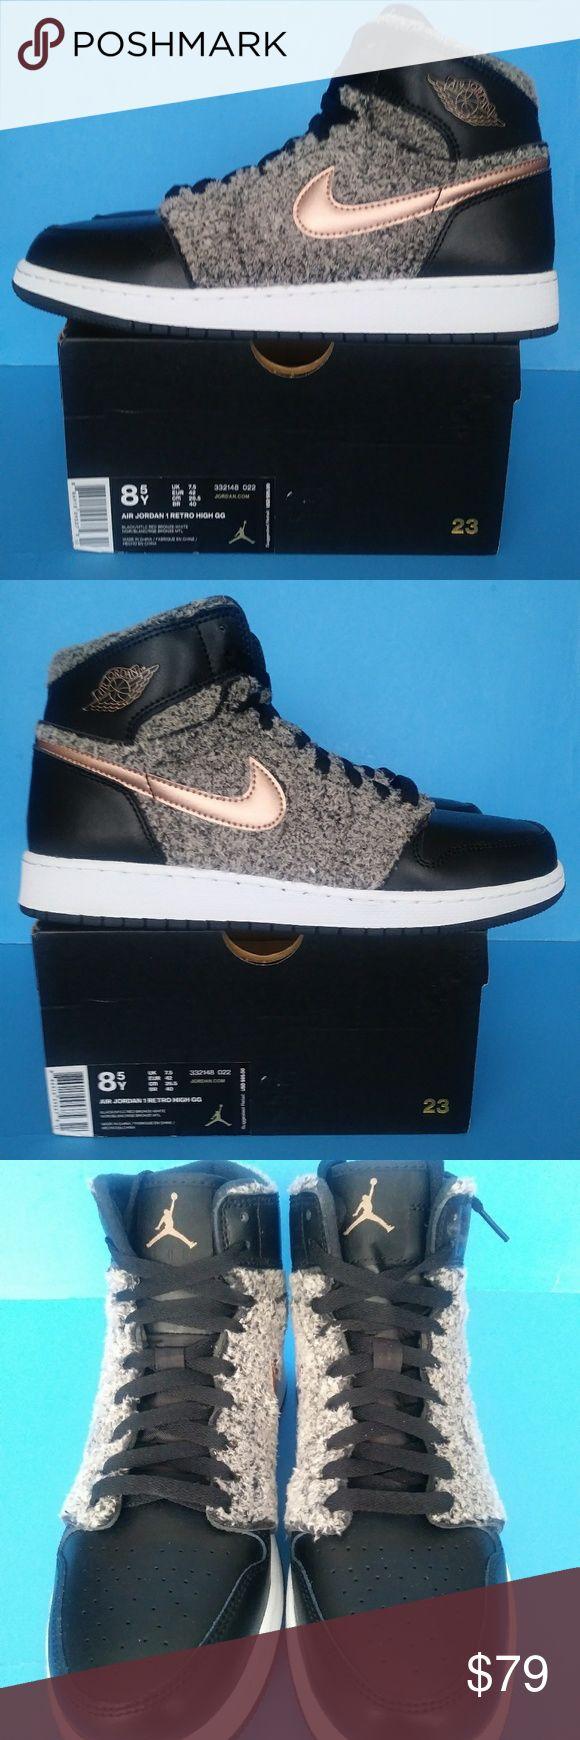 BNIB Air Jordan 1 Retro High SBB Shattered Backboards Shoes Mens Size 11  New DS | Nike Air Jordan 1 Authentic Men's Basketball Shoes | Pinterest |  Air ...